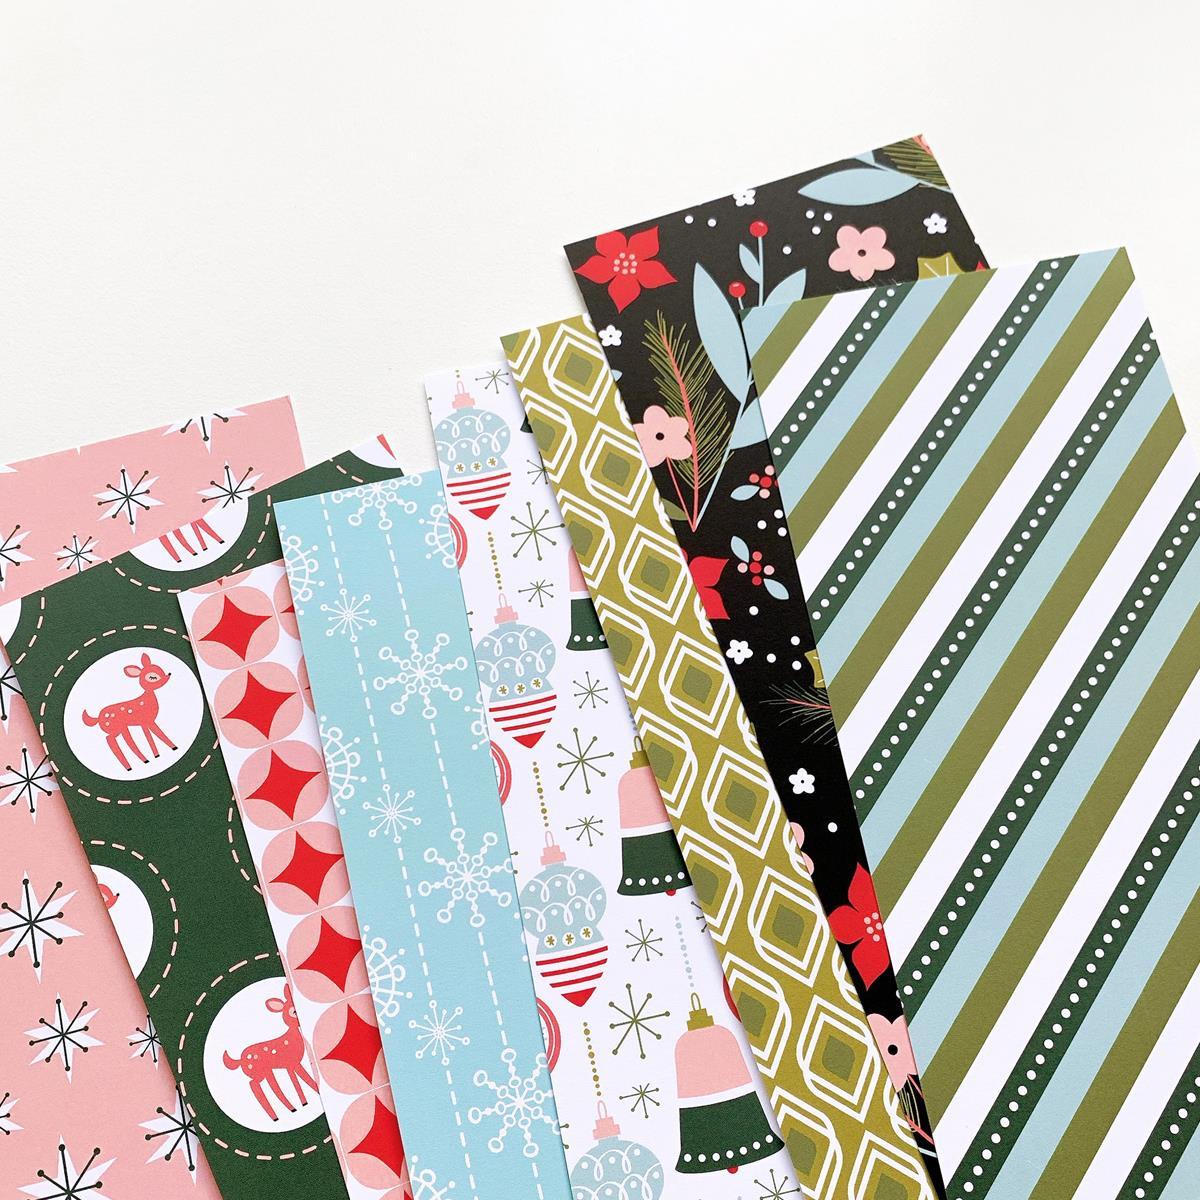 Grandma's Attic Slimline, Catherine Pooler Patterned Paper -